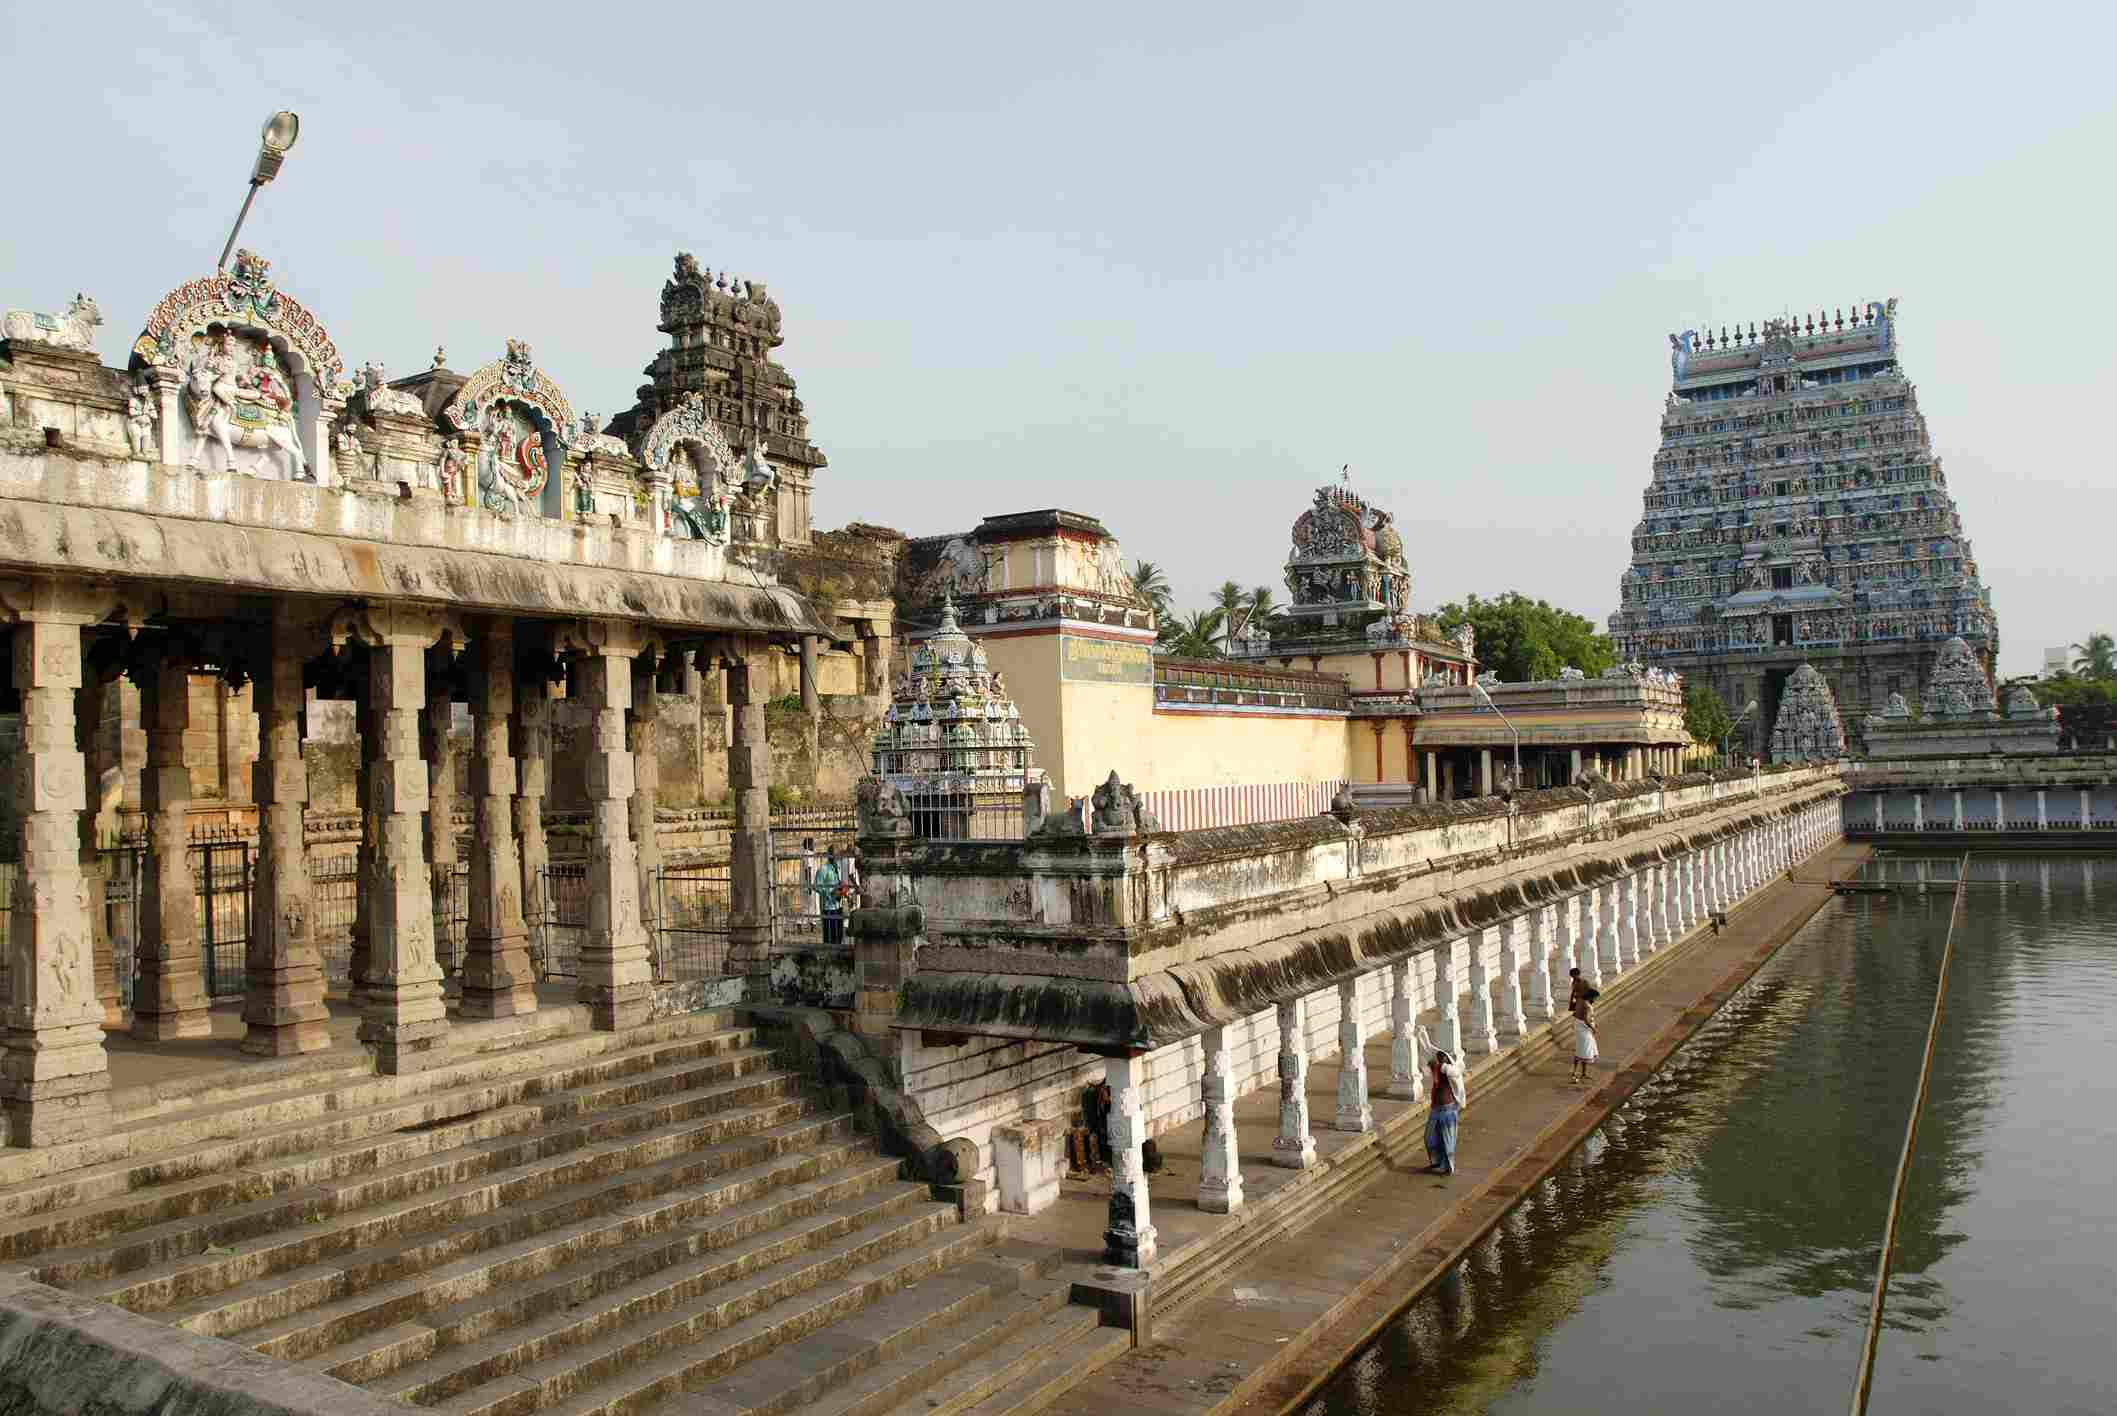 Chidambaram Nataraja temple, Chidambaram, Tamil Nadu